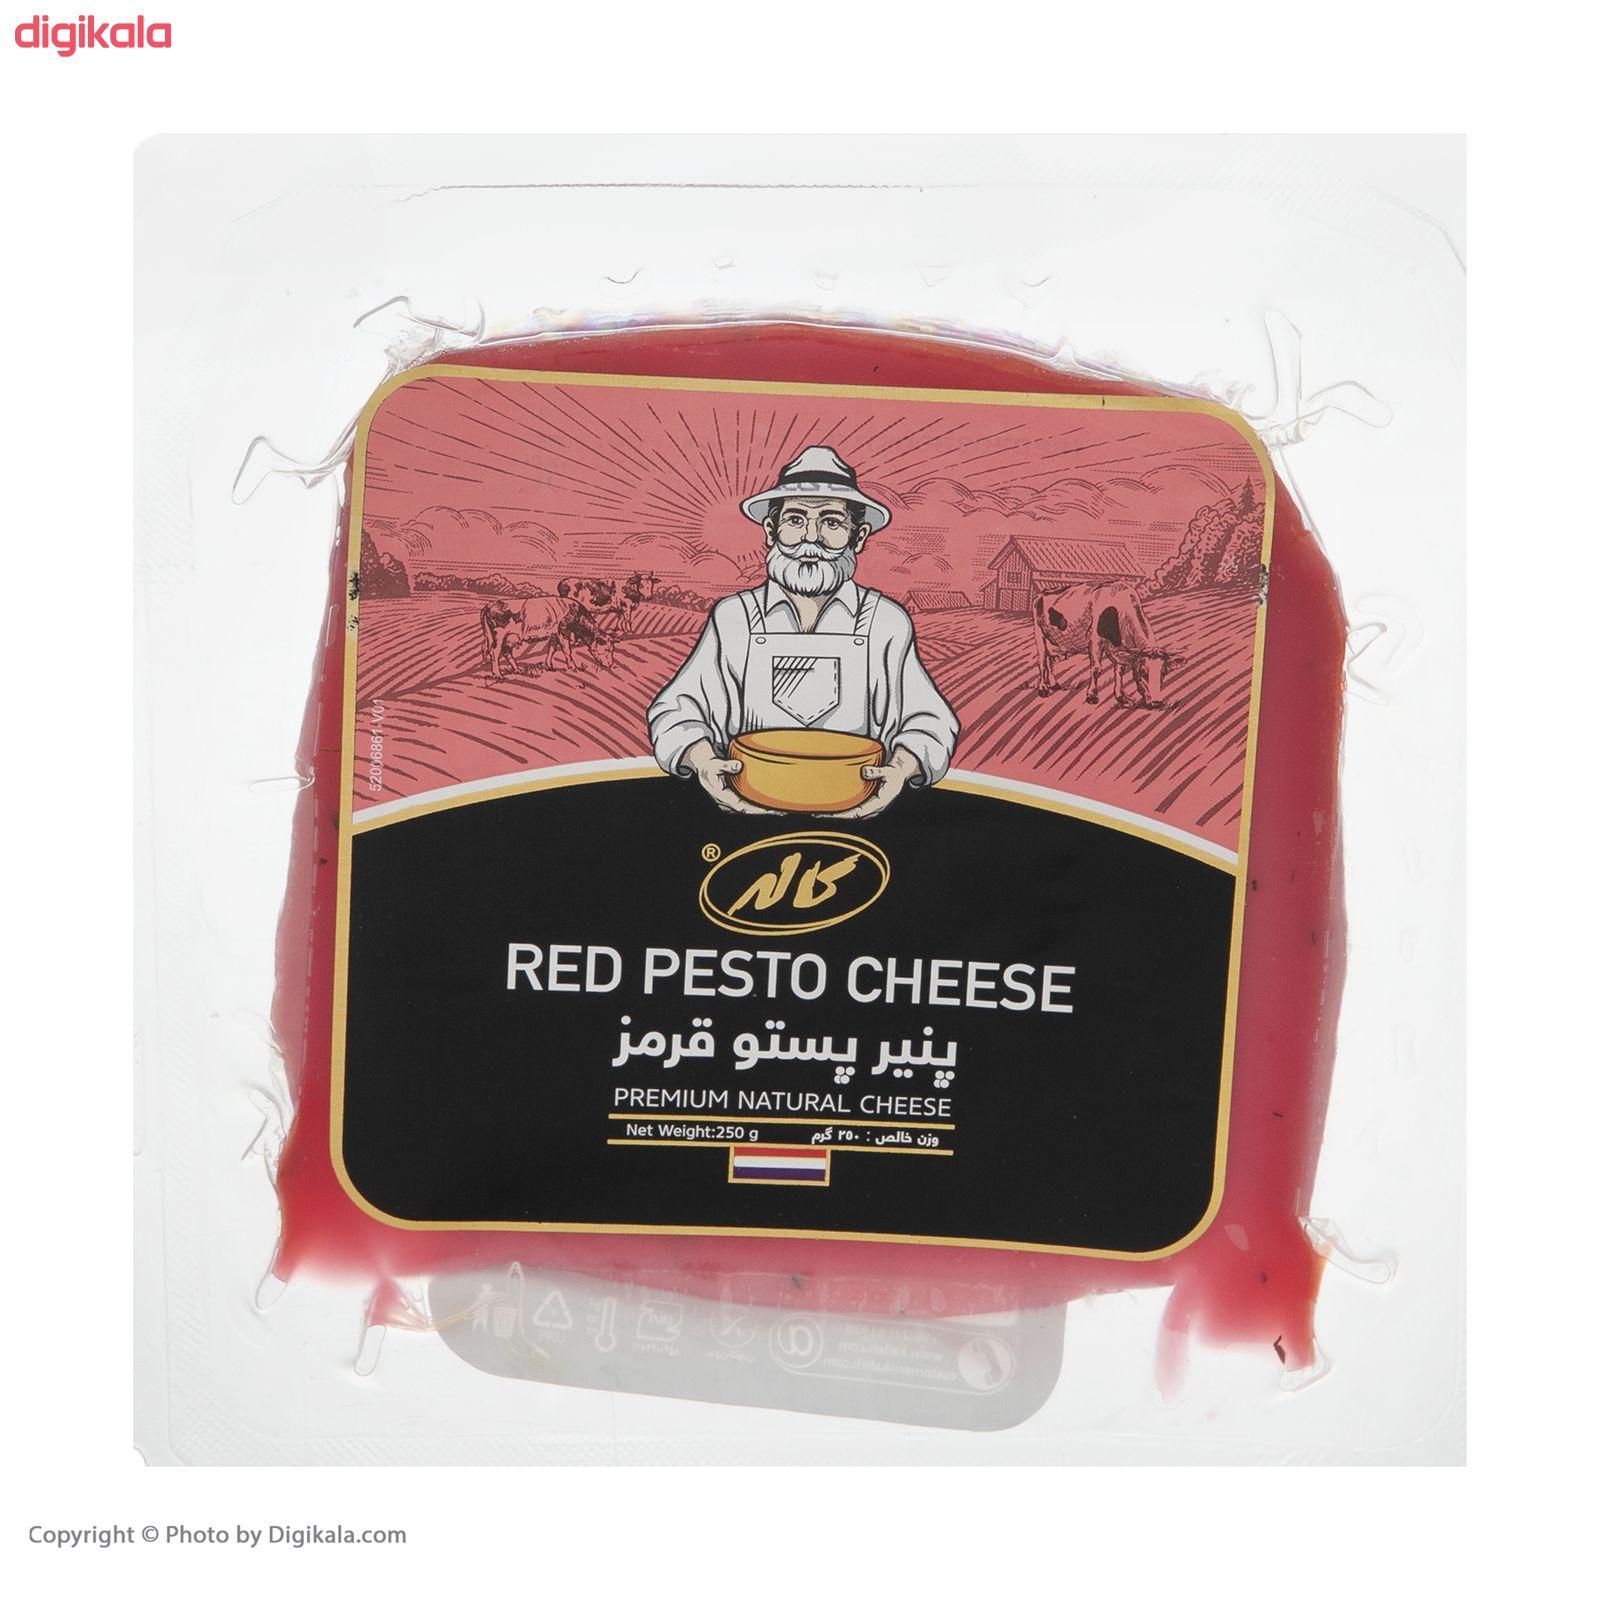 پنیر گودا پستو قرمز کاله مقدار 250 گرم main 1 2